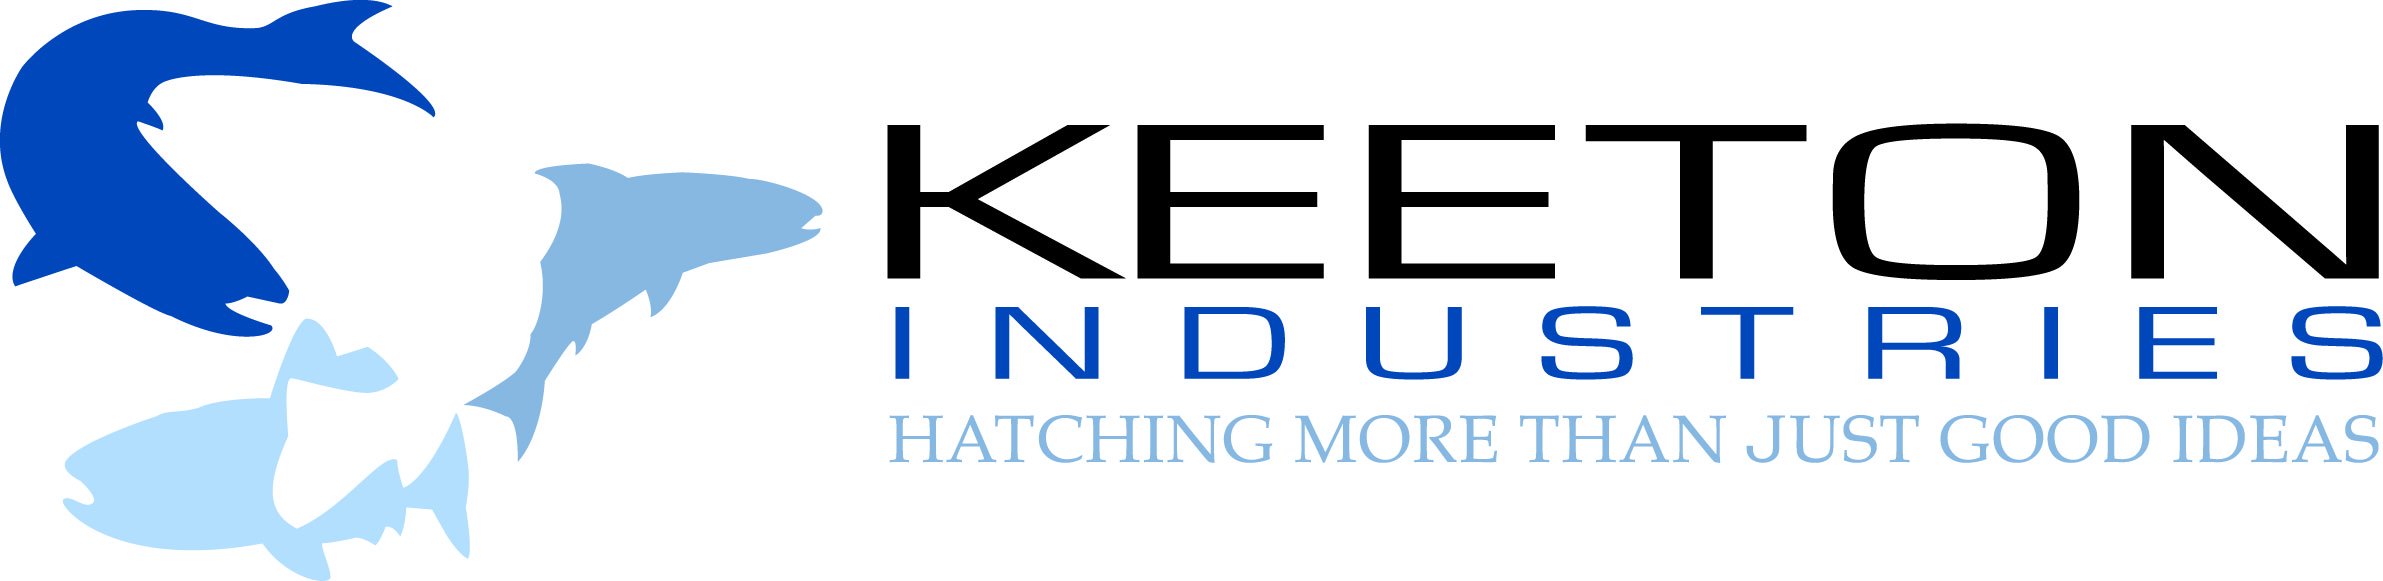 keeton-aqua-logo-color